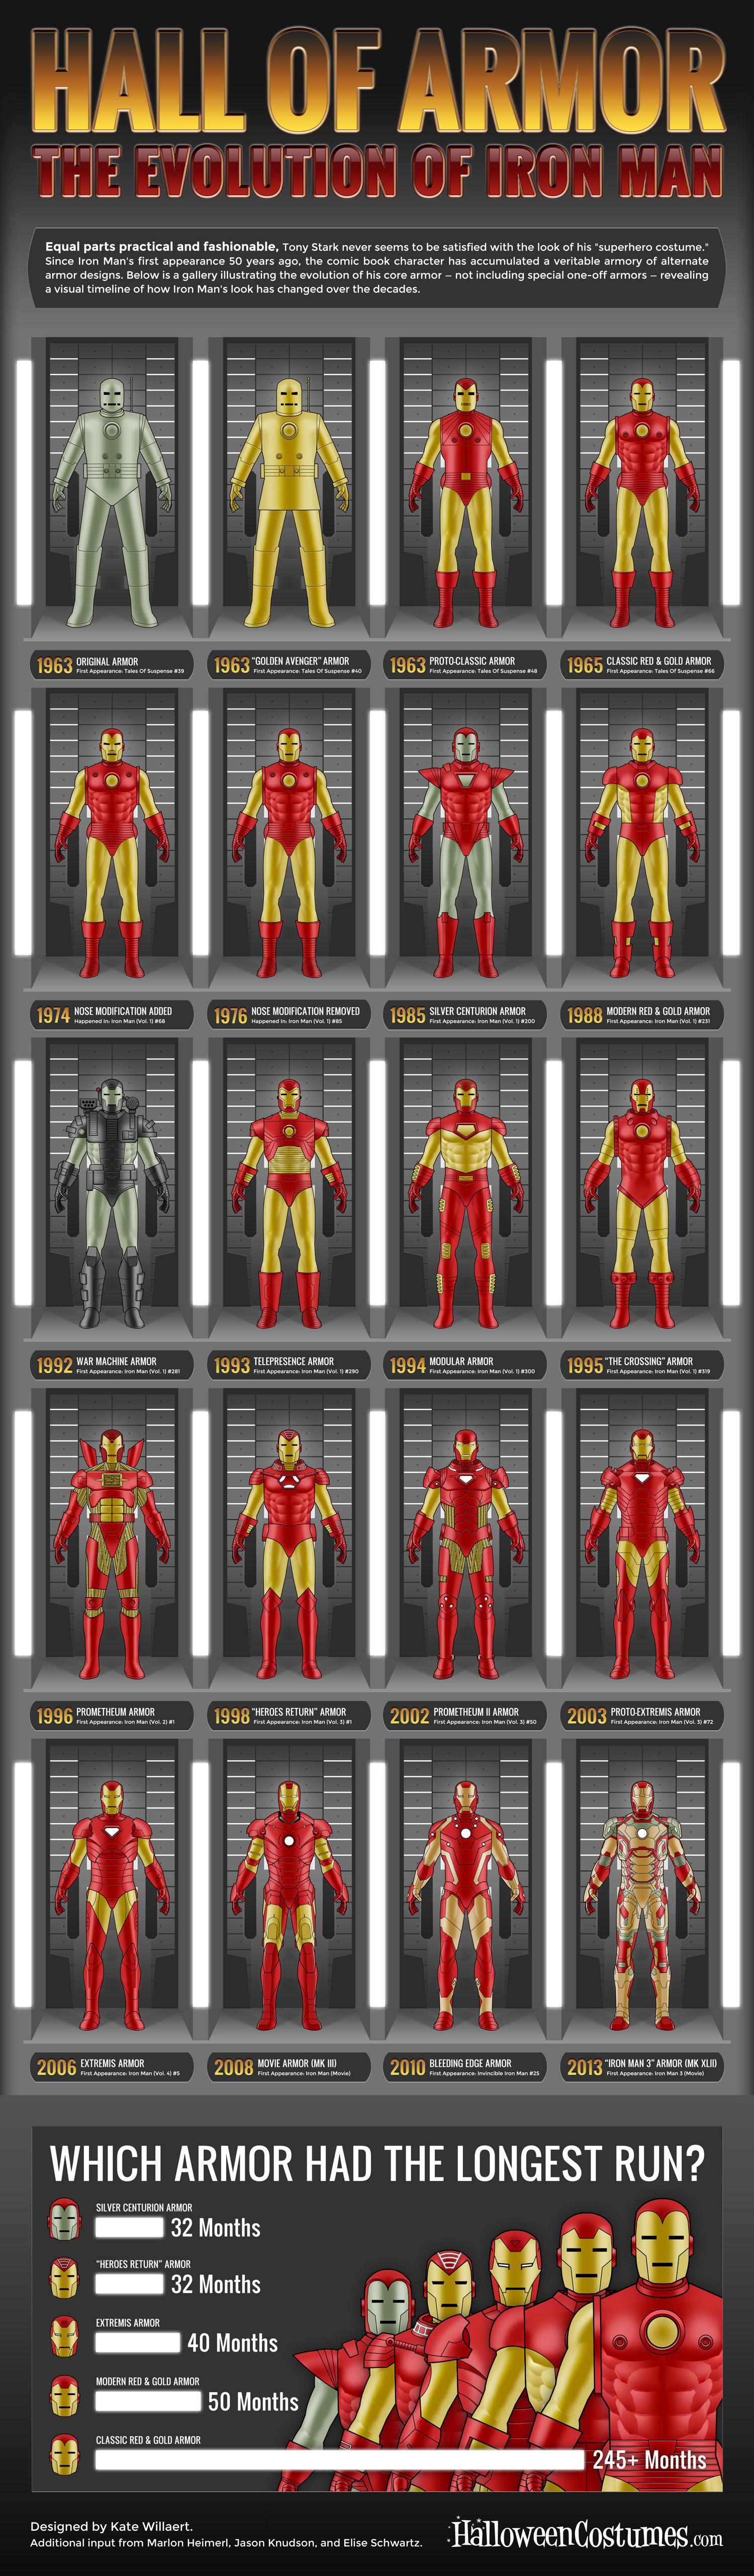 Iron Man Armor Infographic